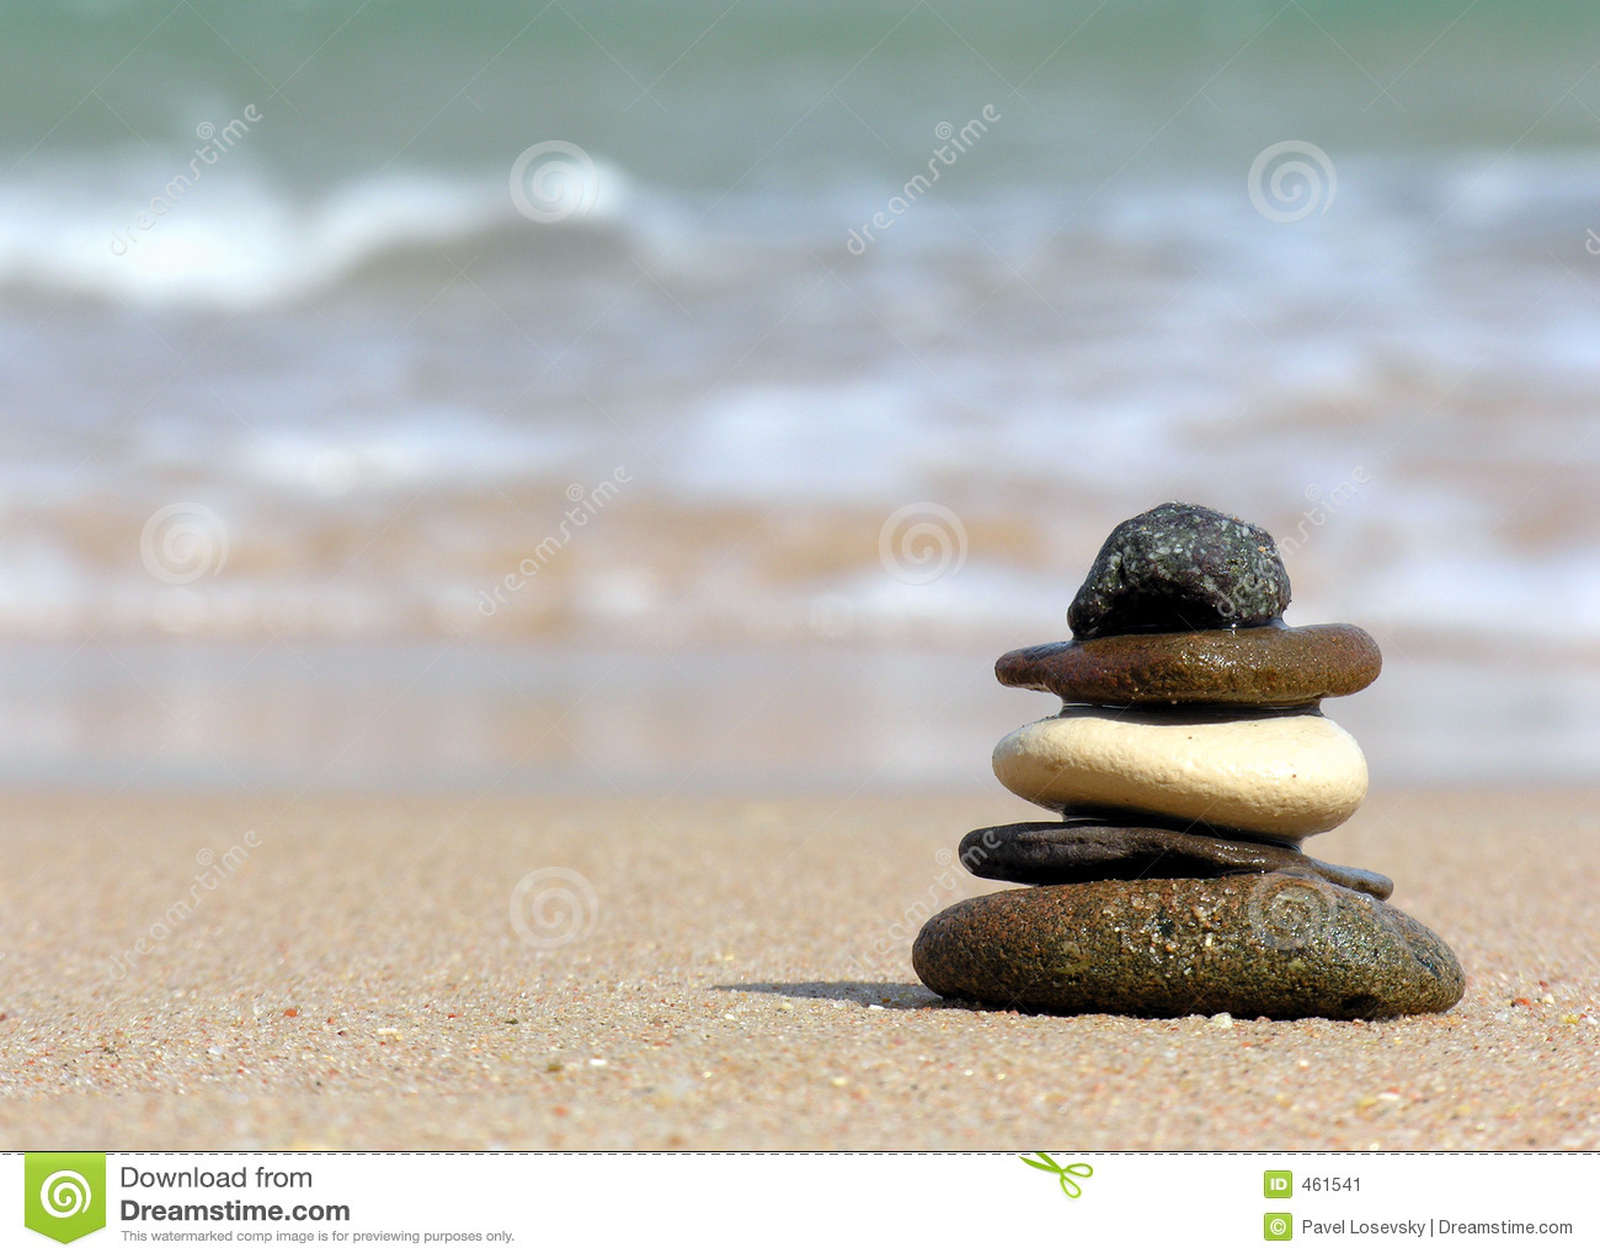 pyramide der steine strand stockbild bild 461541. Black Bedroom Furniture Sets. Home Design Ideas